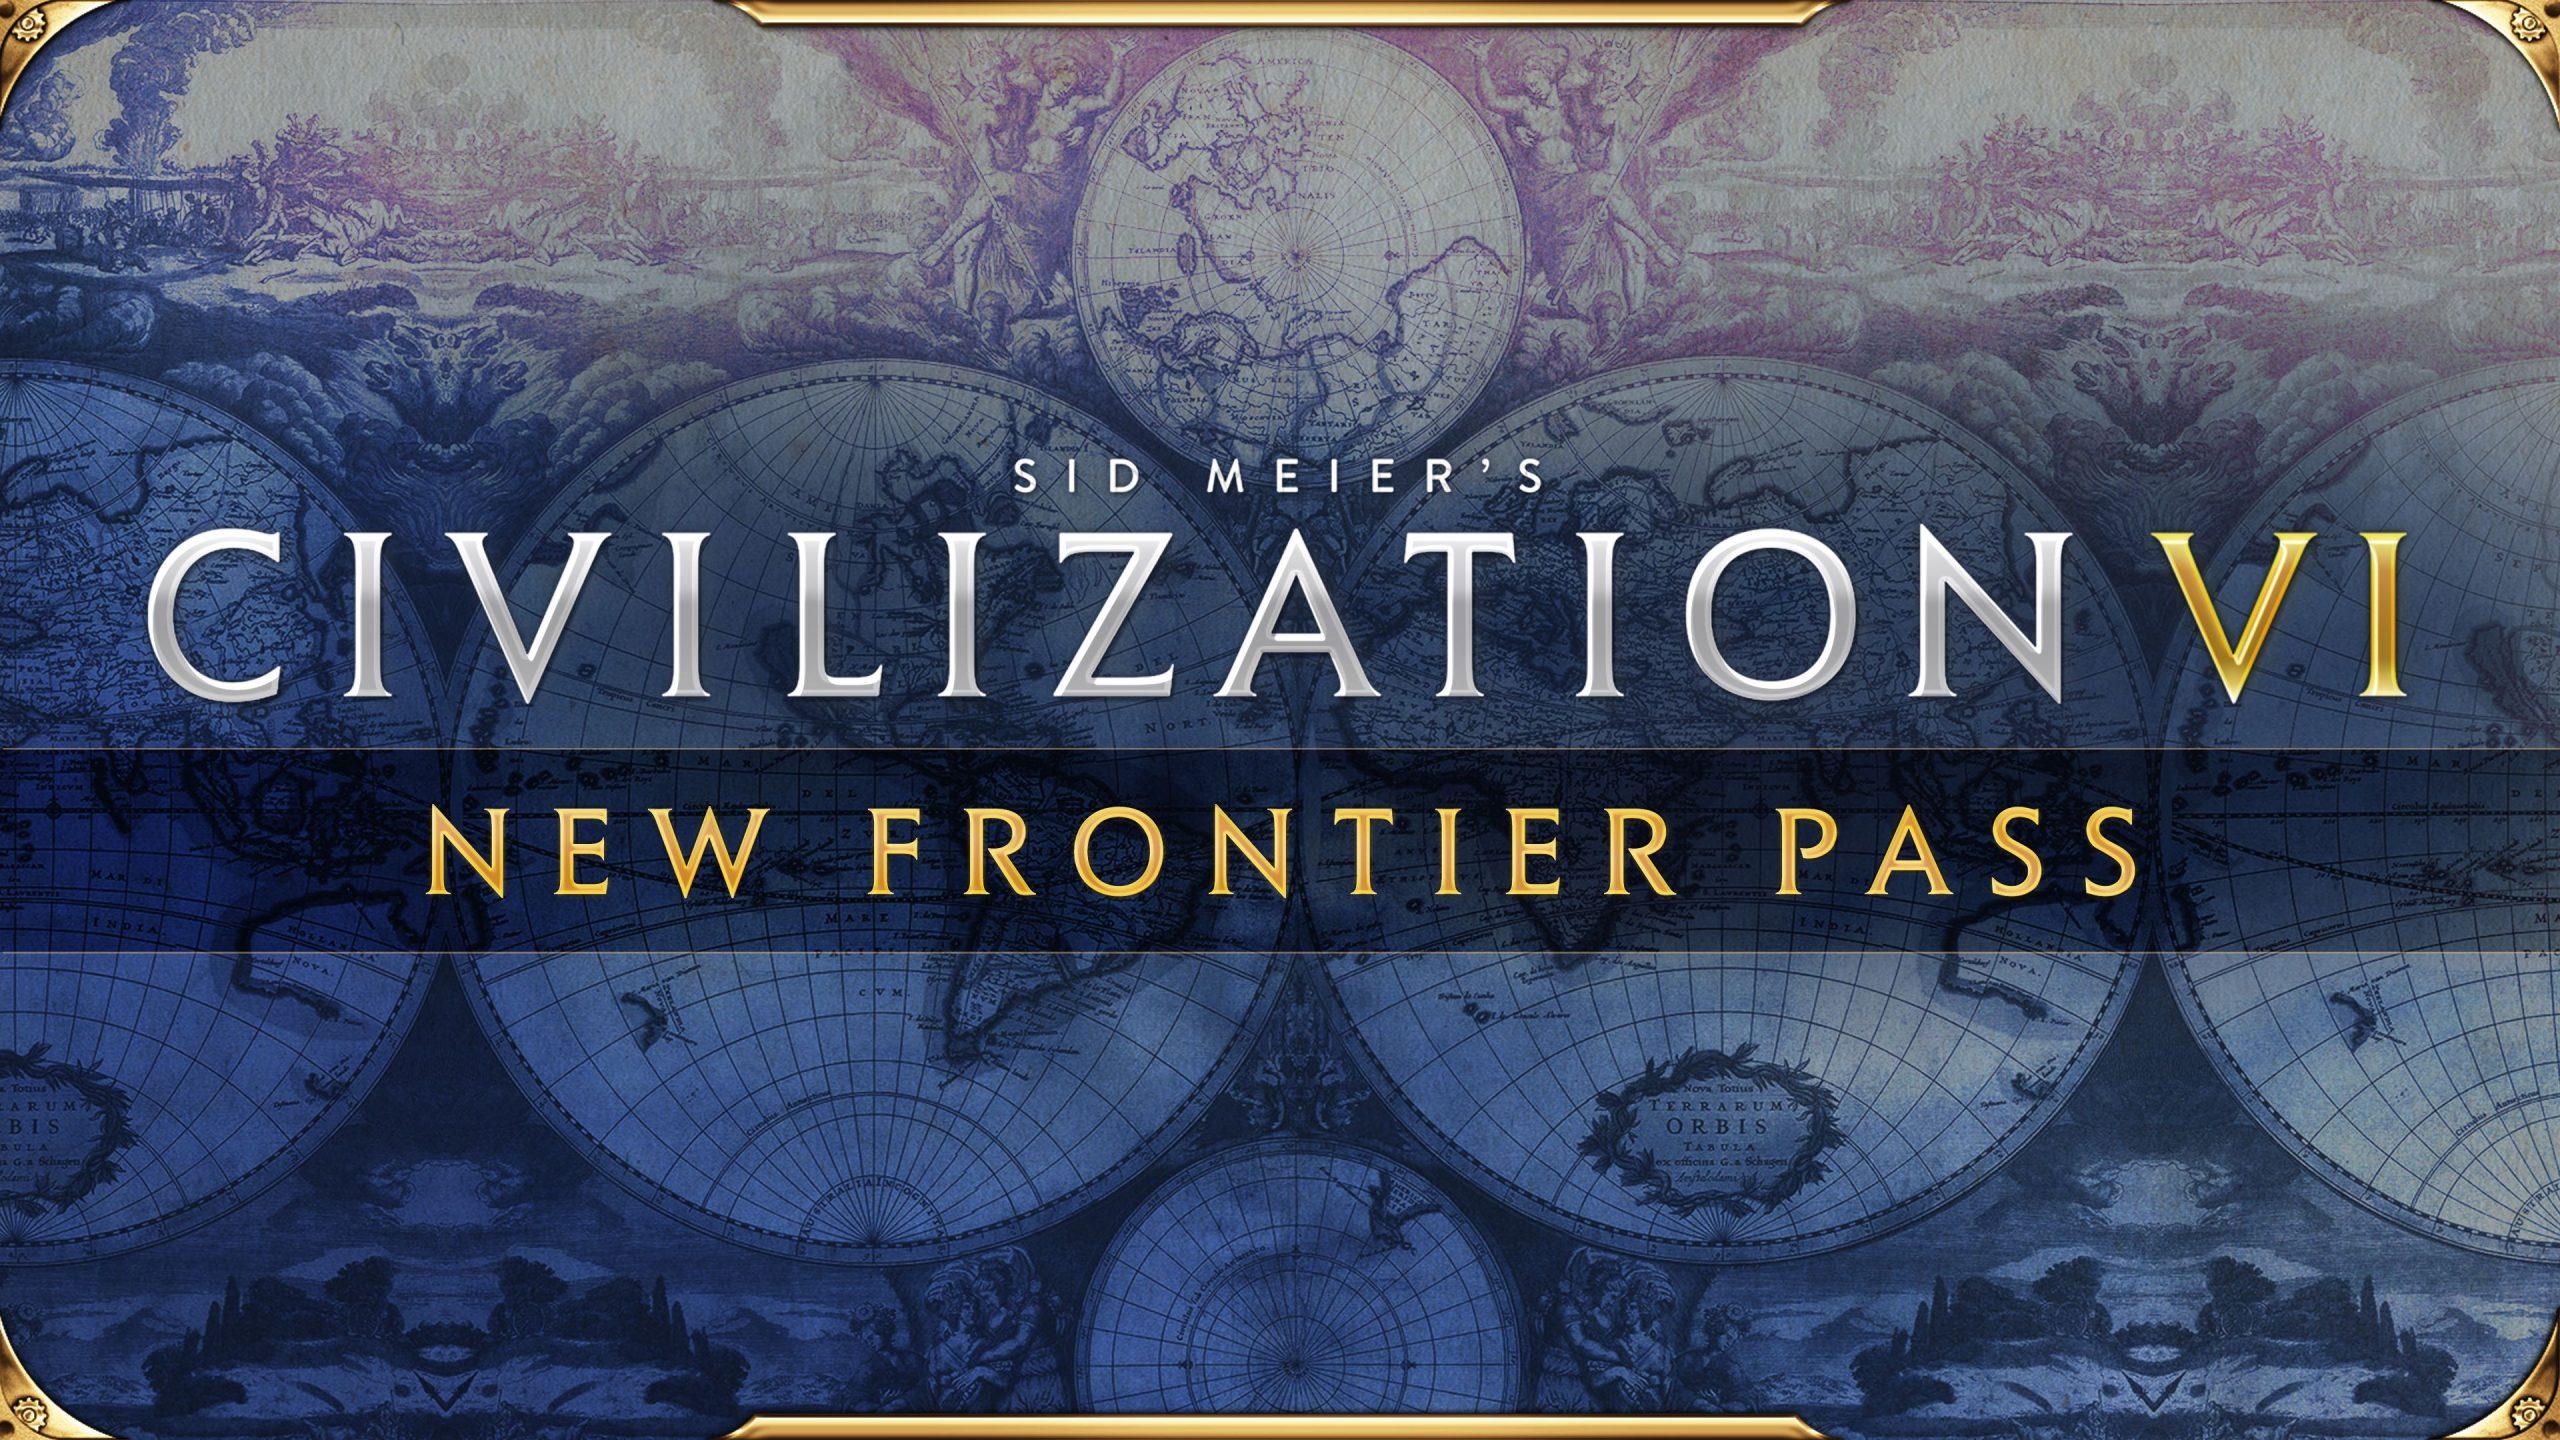 Sid Meier's Civilization VI New Frontier Pass logo